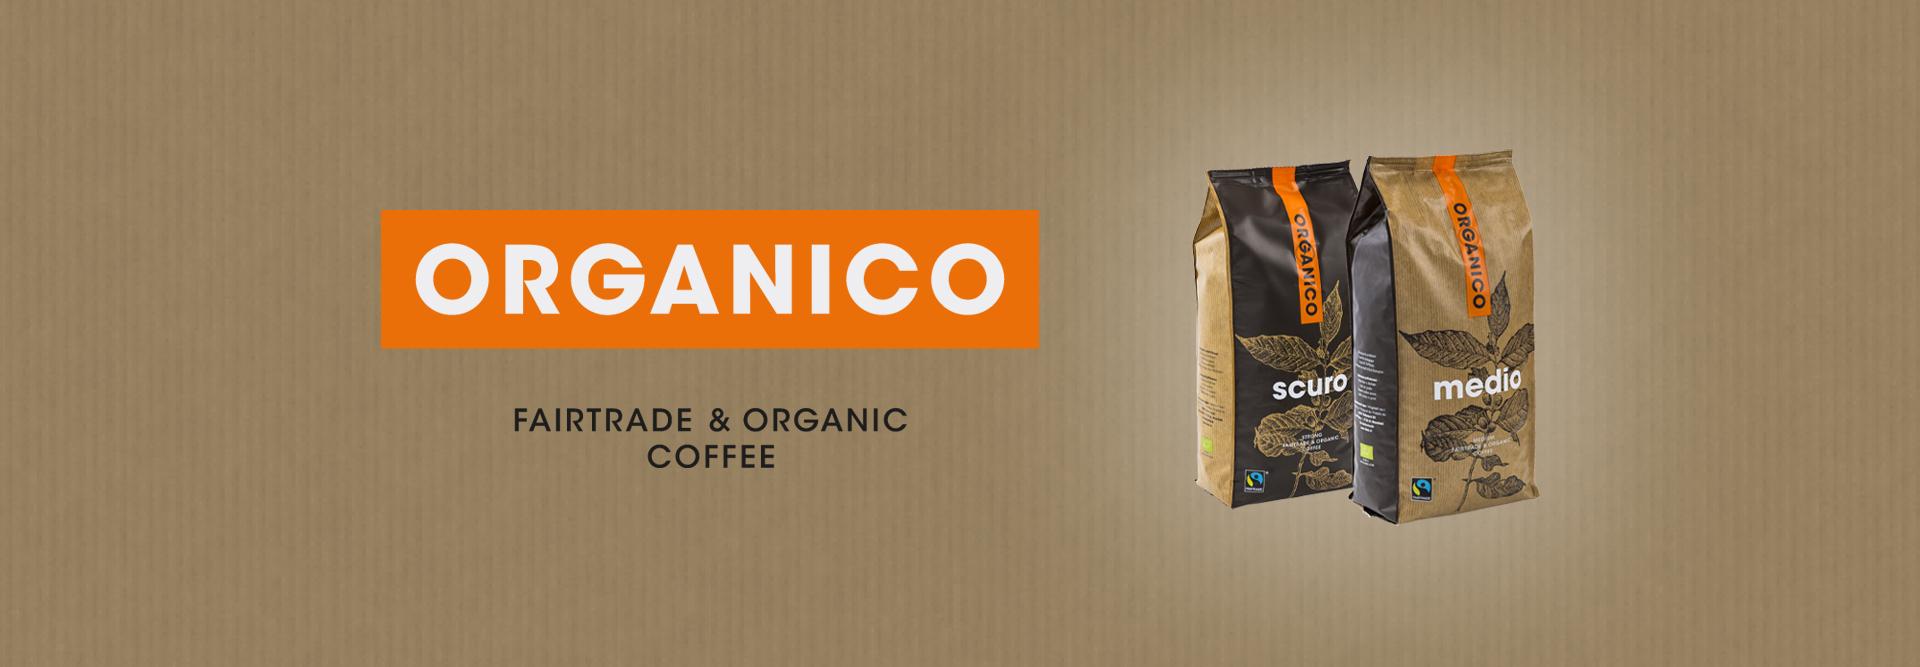 Hero image Organico espresso.jpg